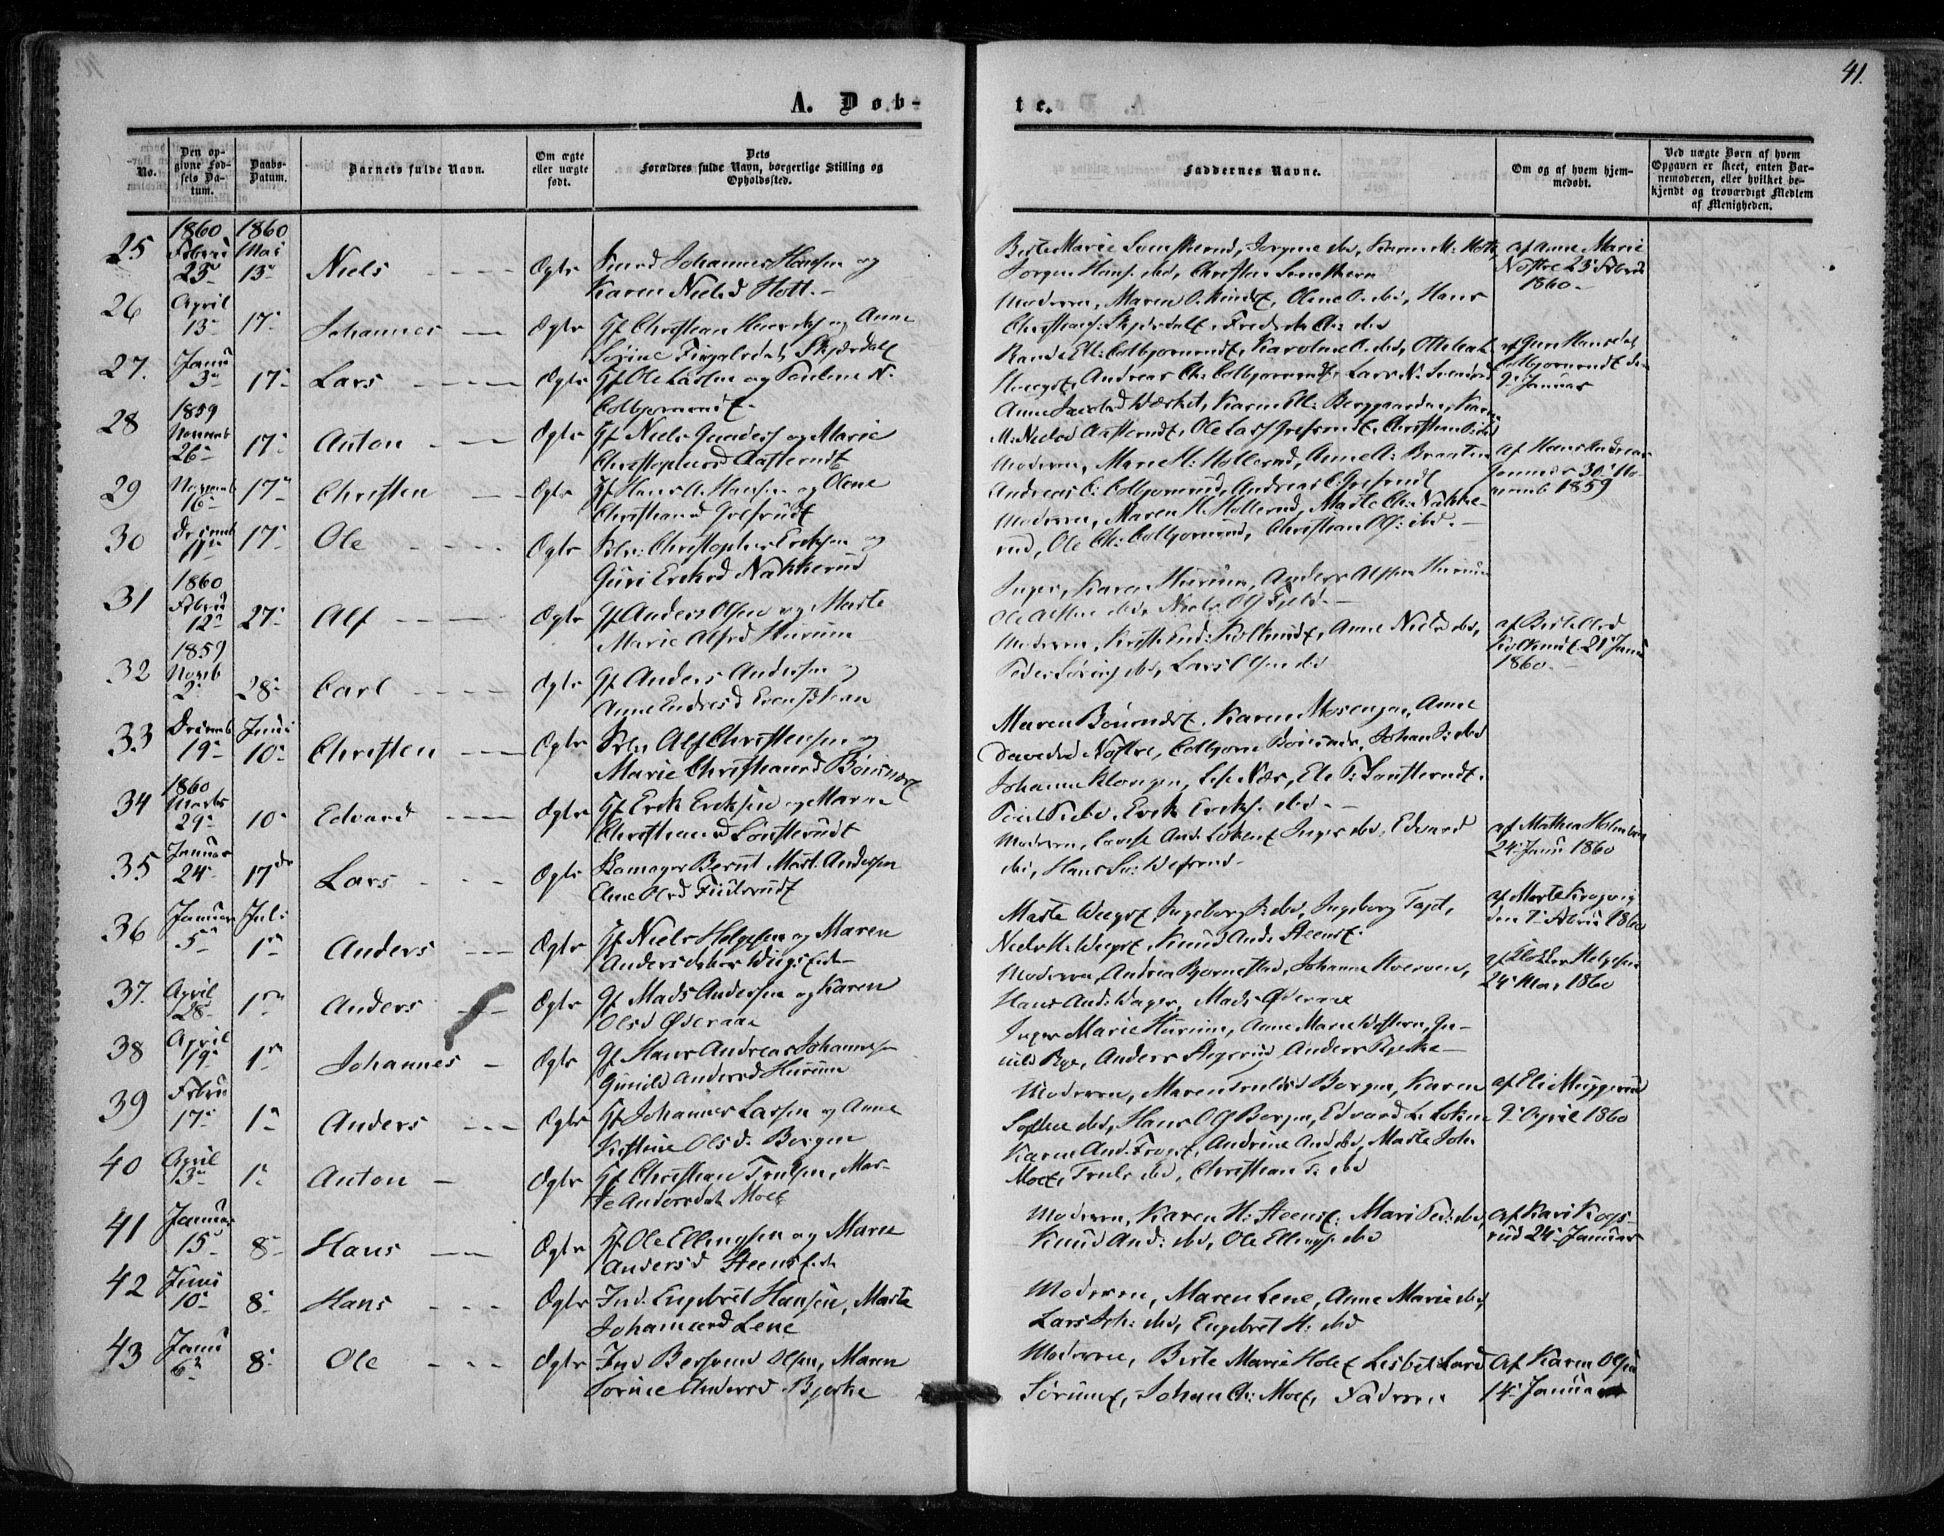 SAKO, Hole kirkebøker, F/Fa/L0006: Ministerialbok nr. I 6, 1852-1872, s. 41